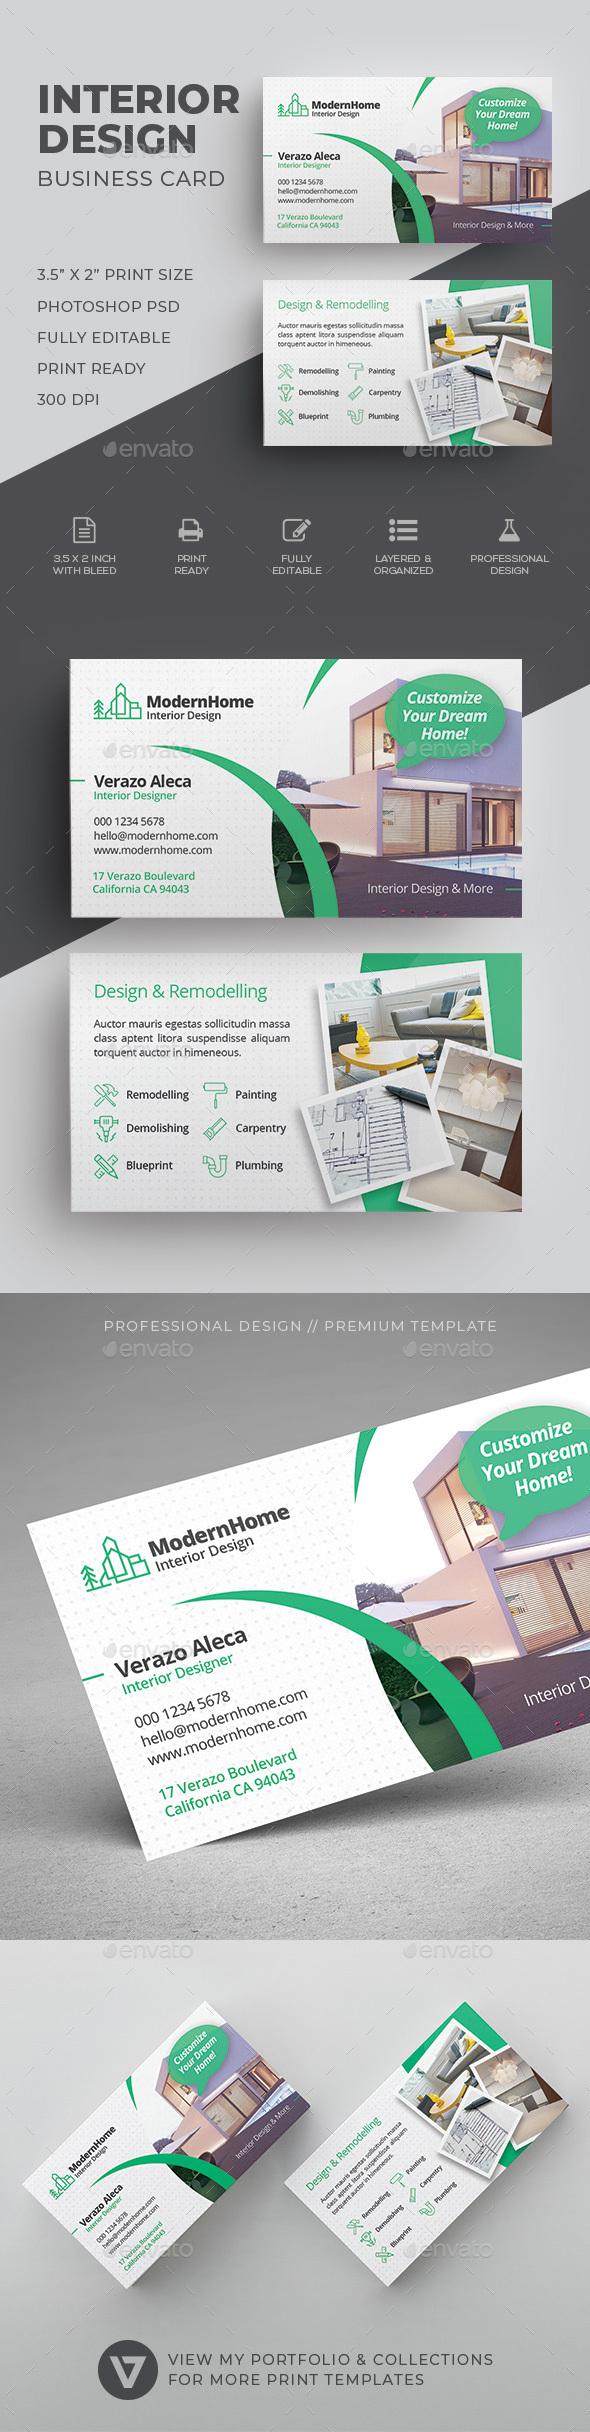 interior design business card industry specific business cards - Interior Design Business Cards